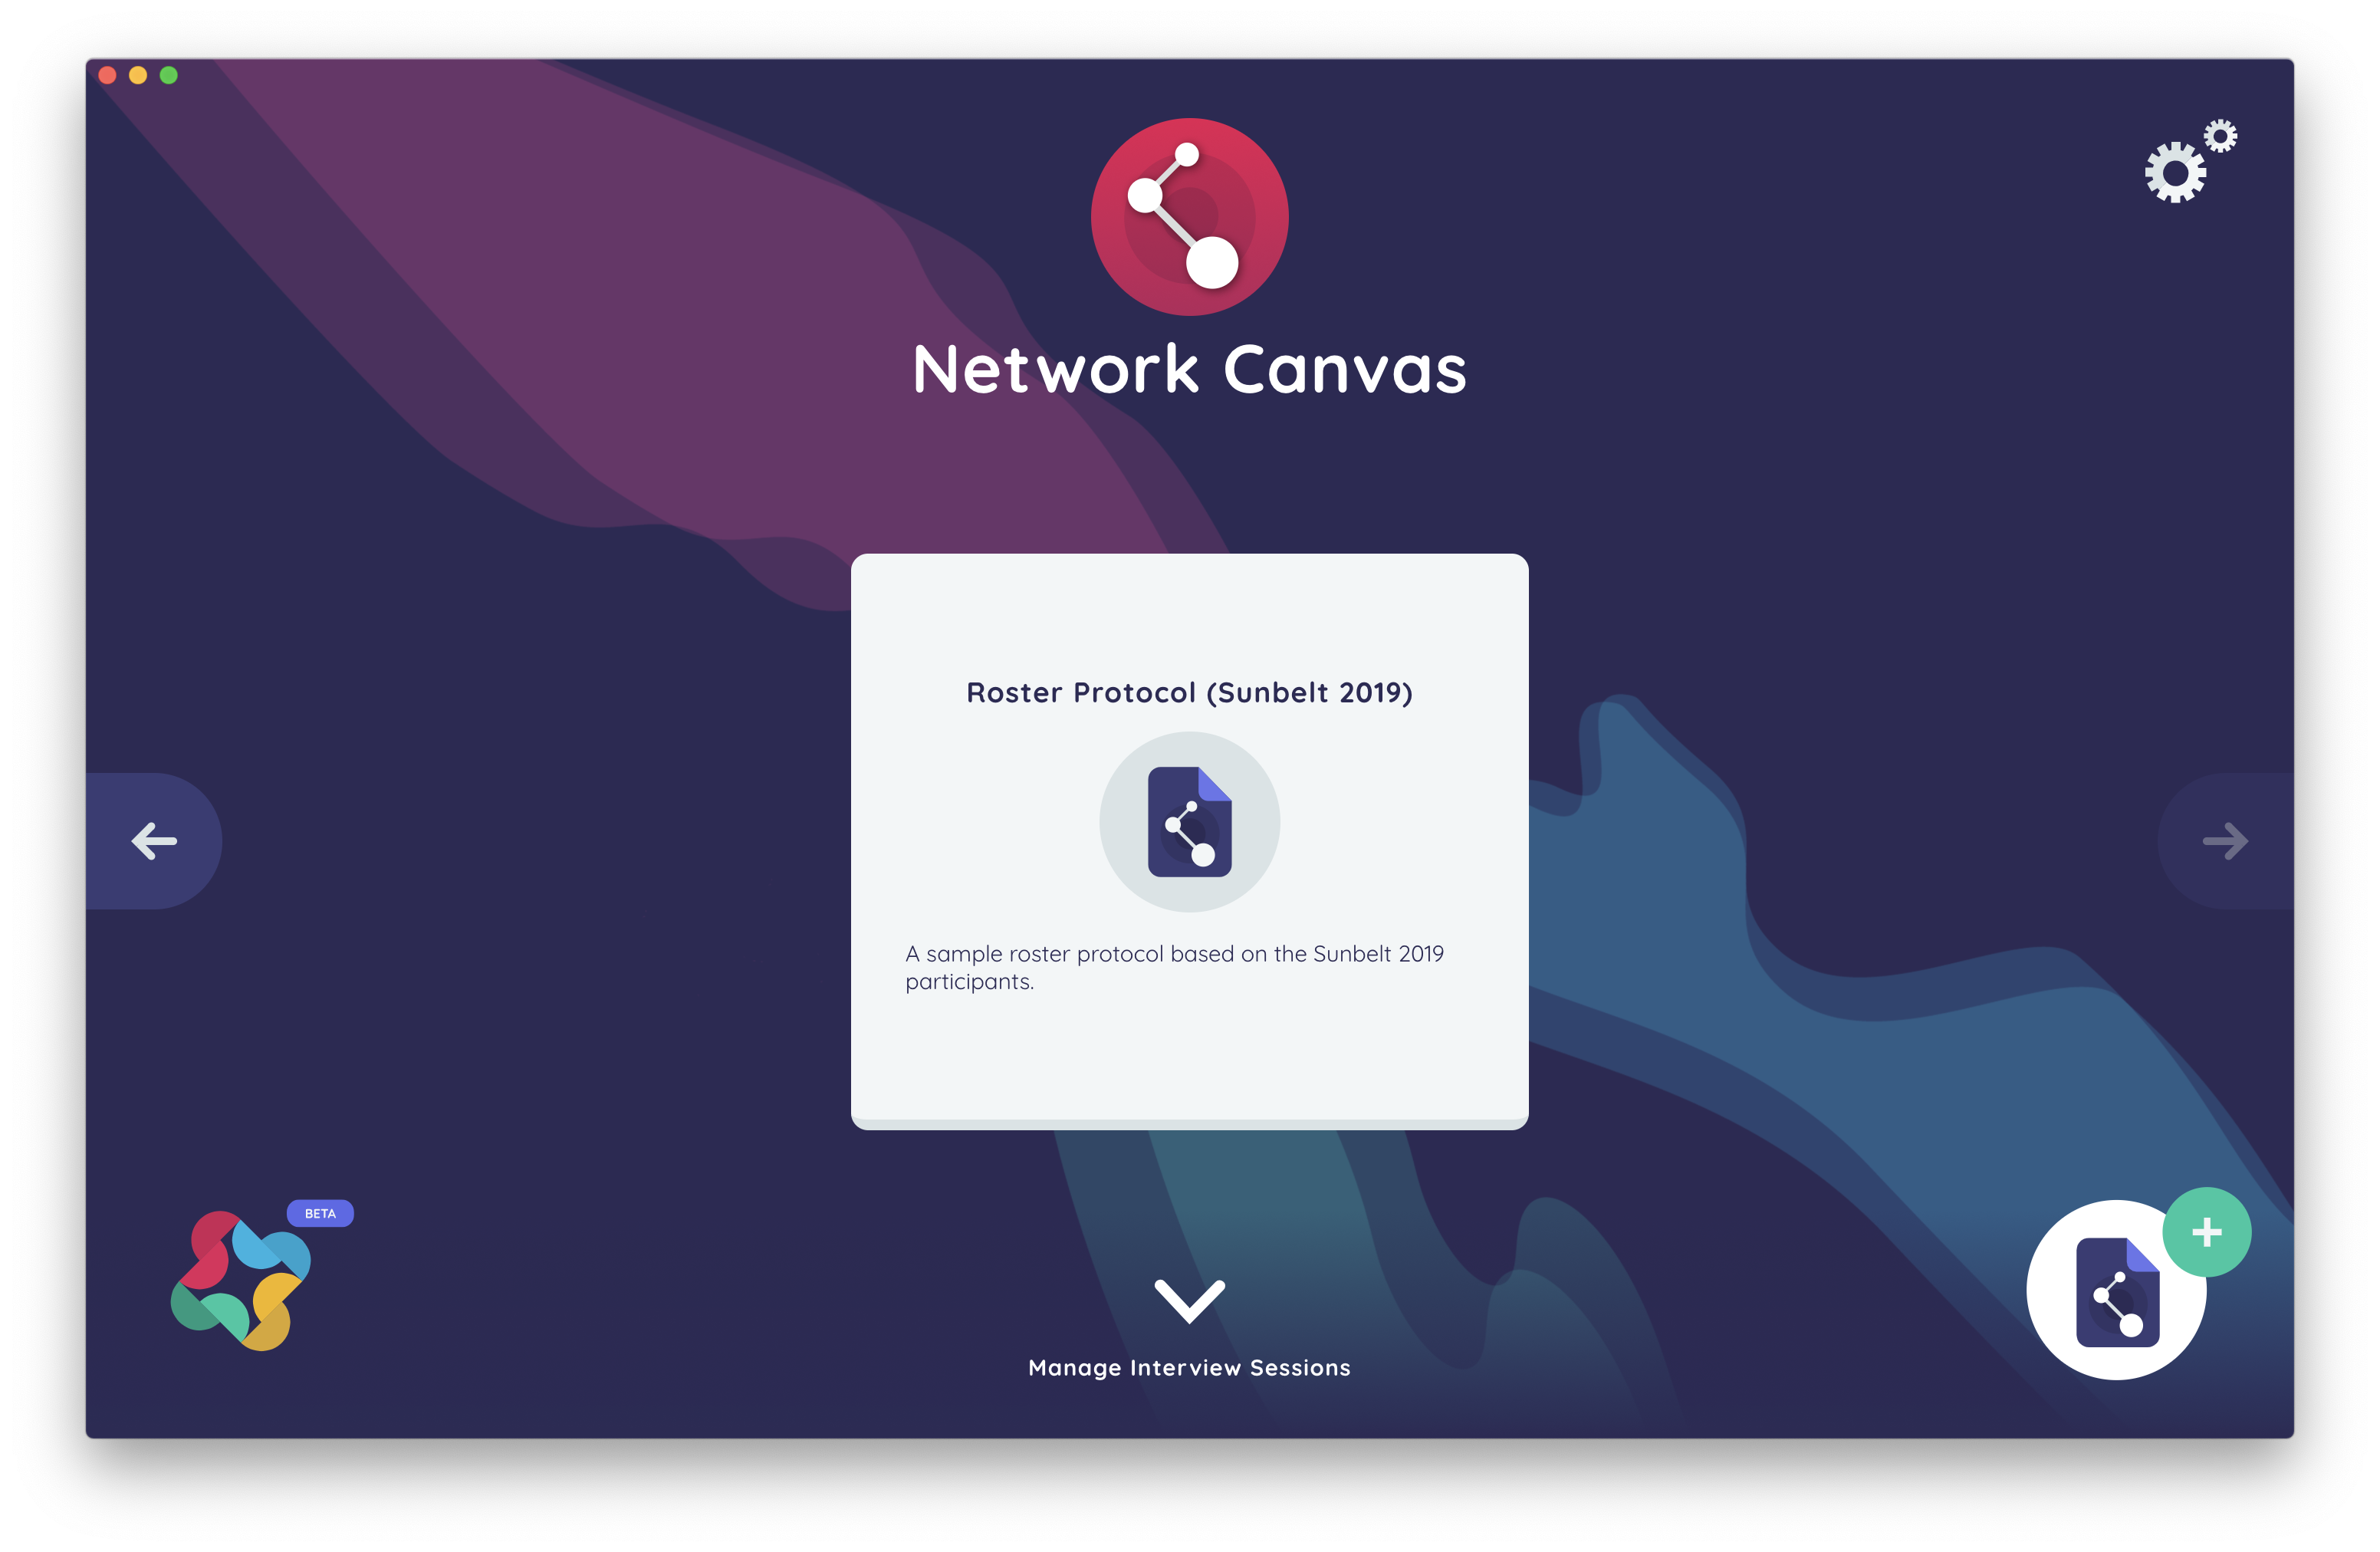 The Network Canvas Start Screen